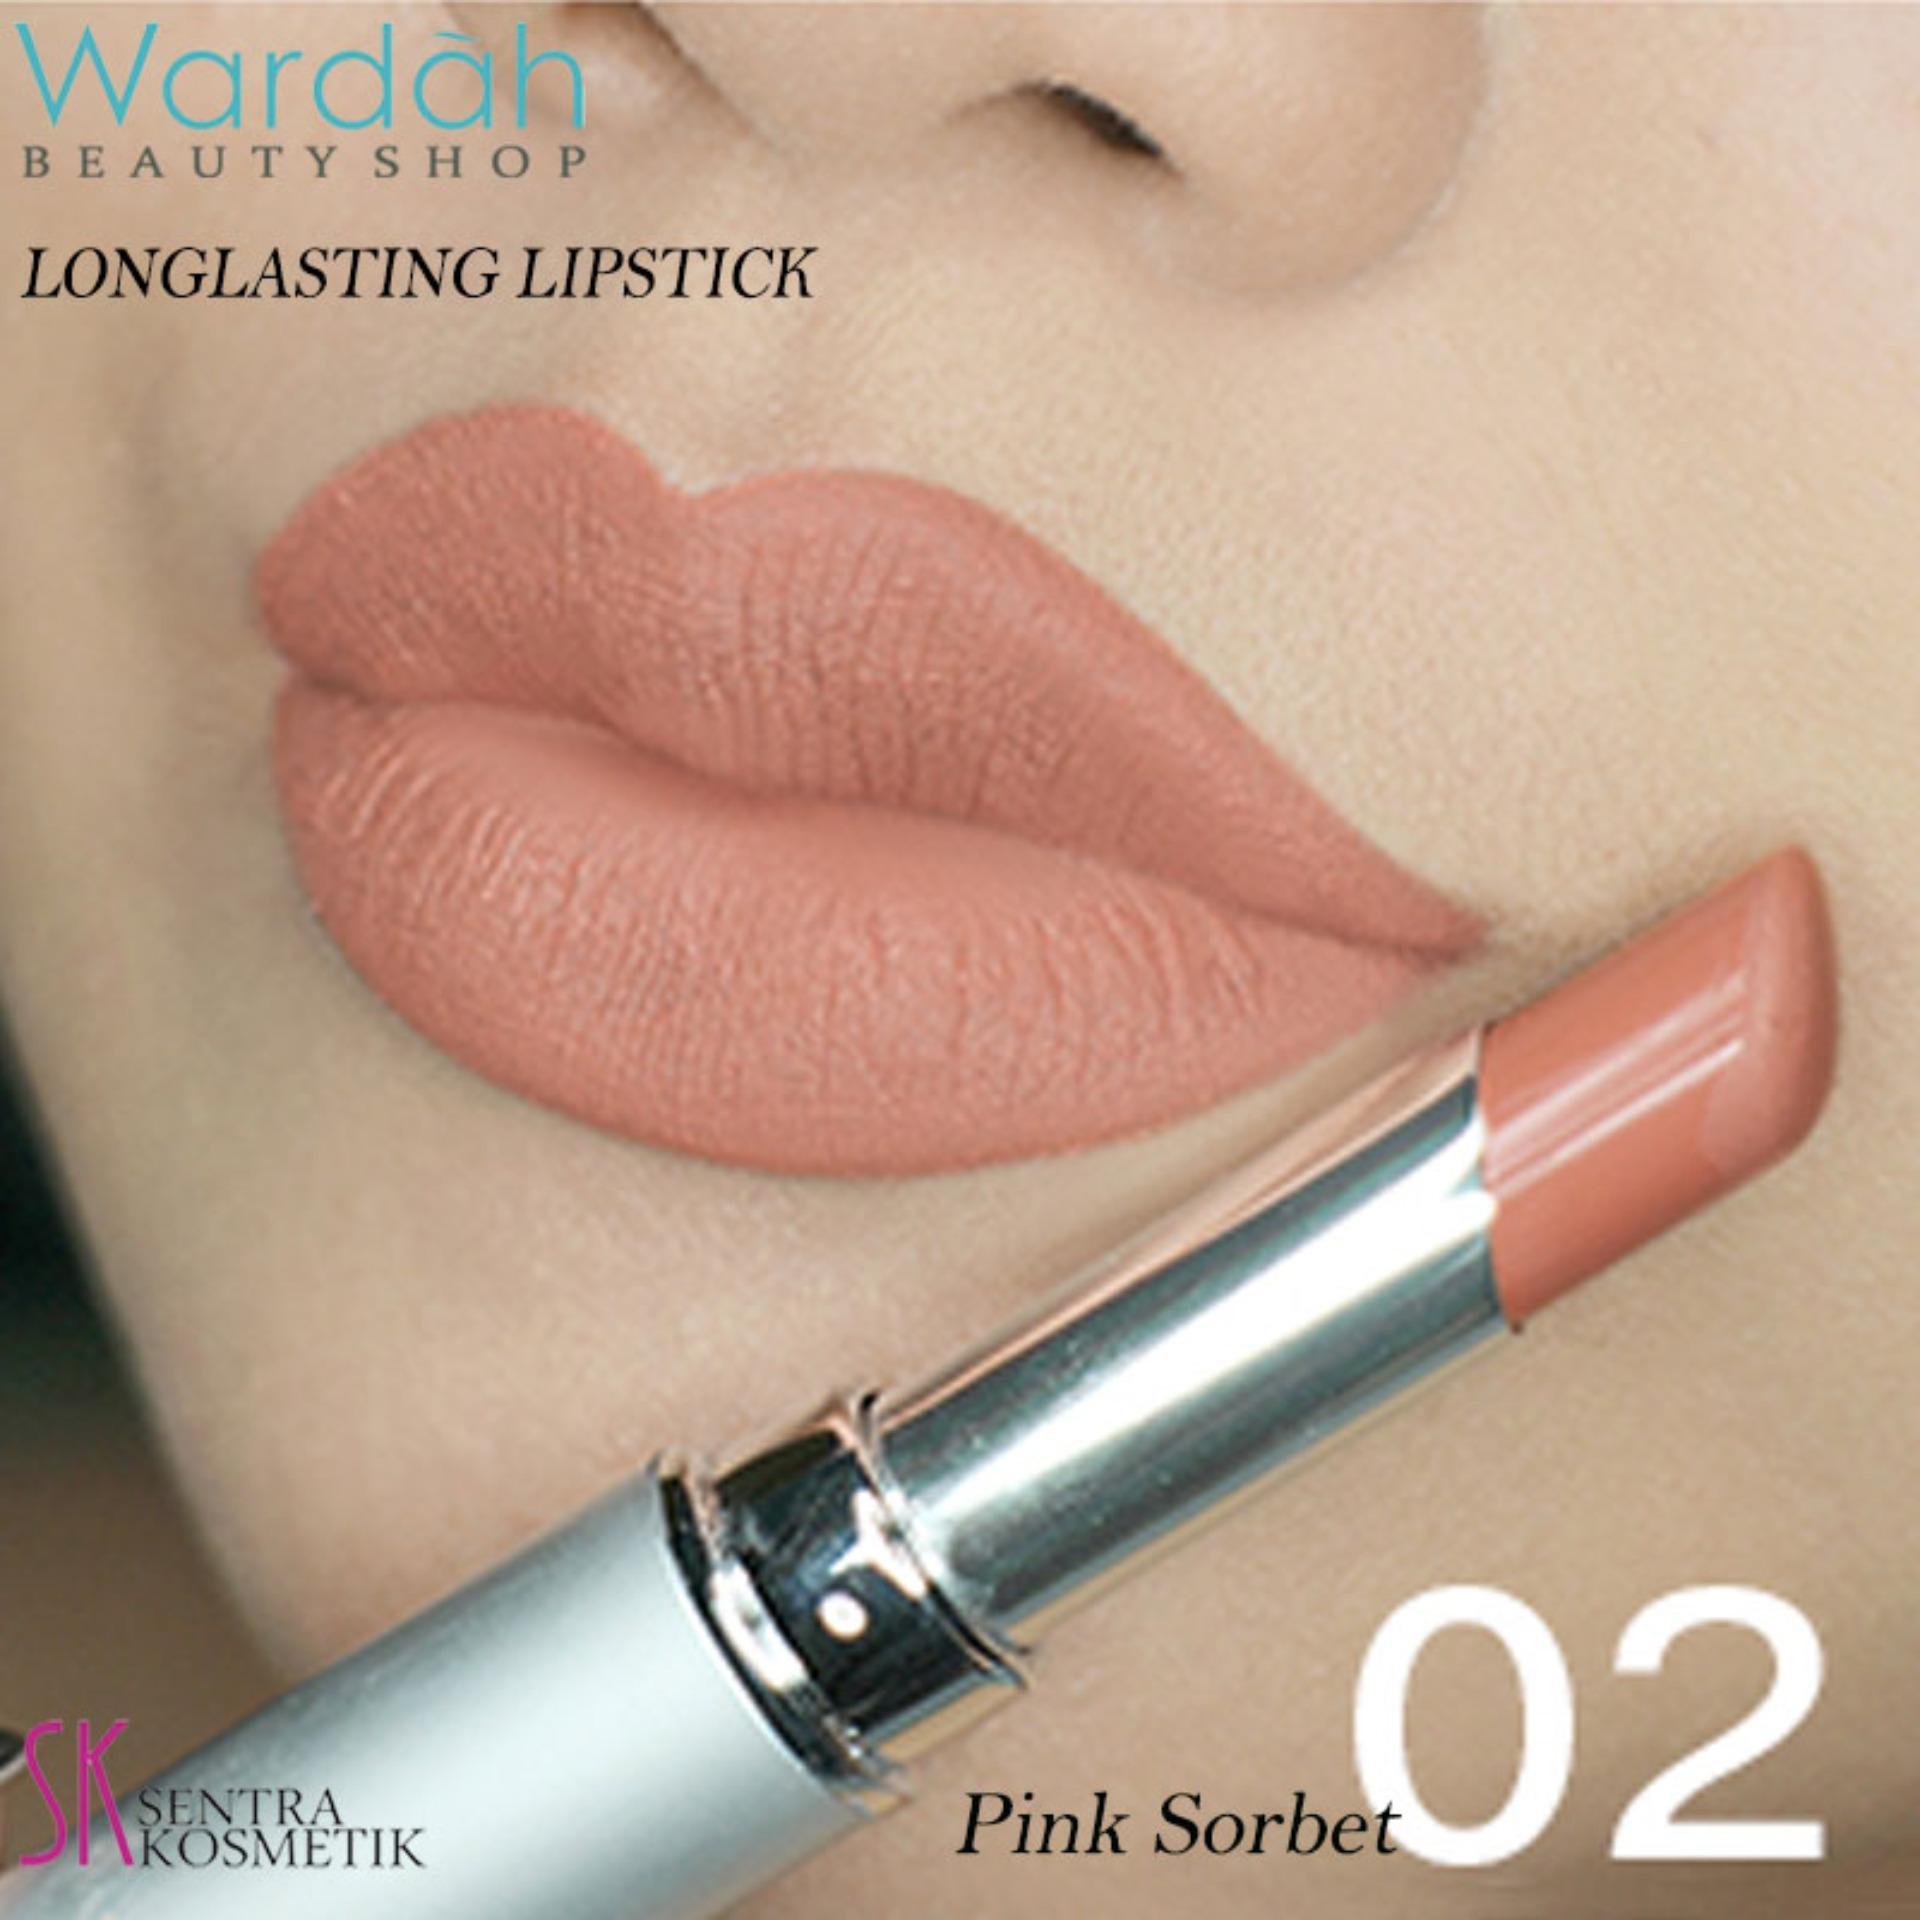 Wardah LONGLASTING Lipstick No.02 Pink Sorbet